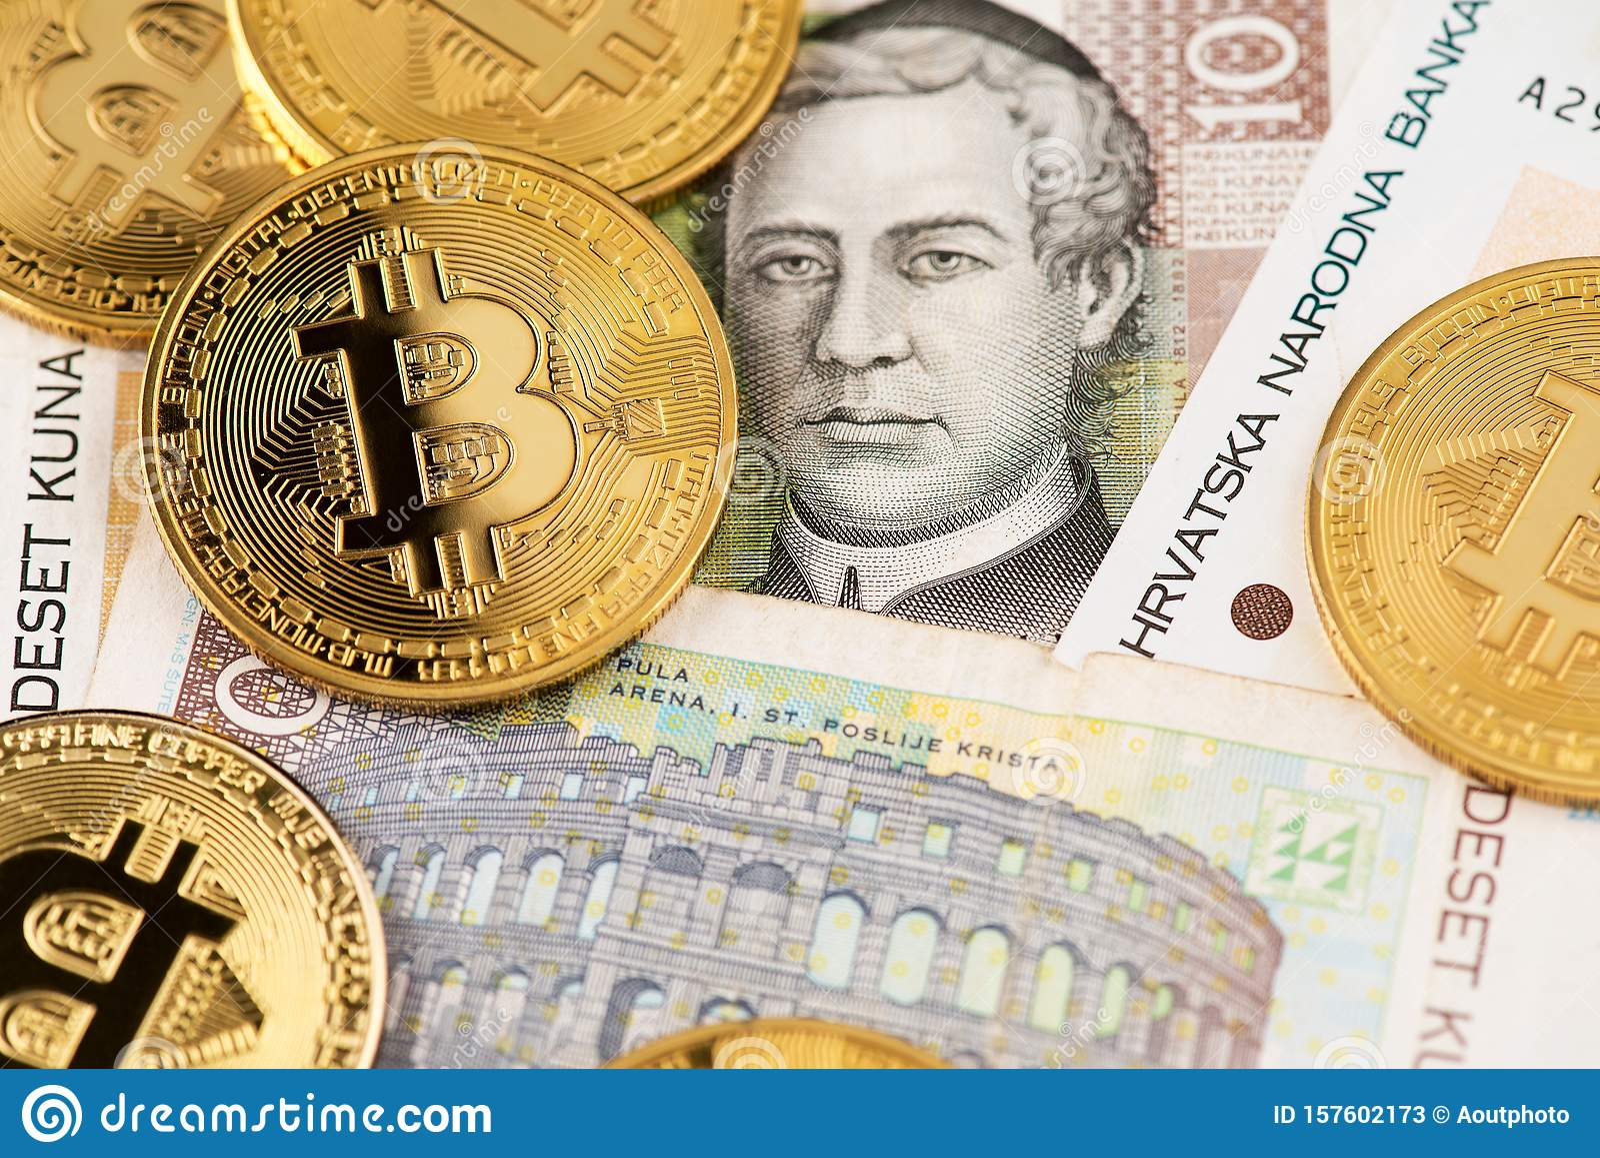 bitcoin croazia)